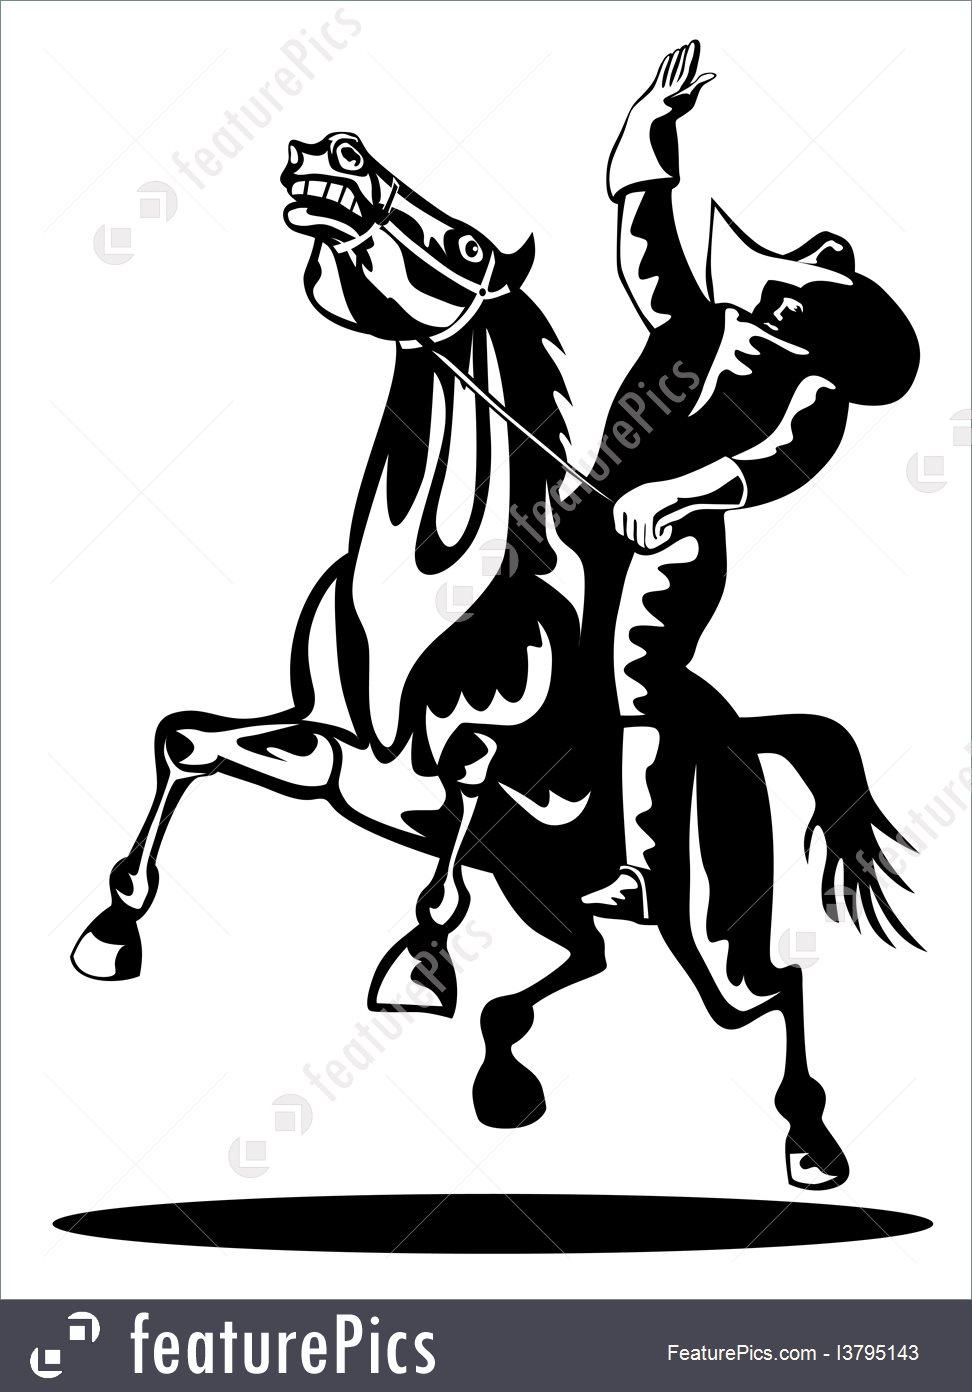 972x1392 Illustration Of Rodeo Cowboy Riding Bucking Bronco Horse